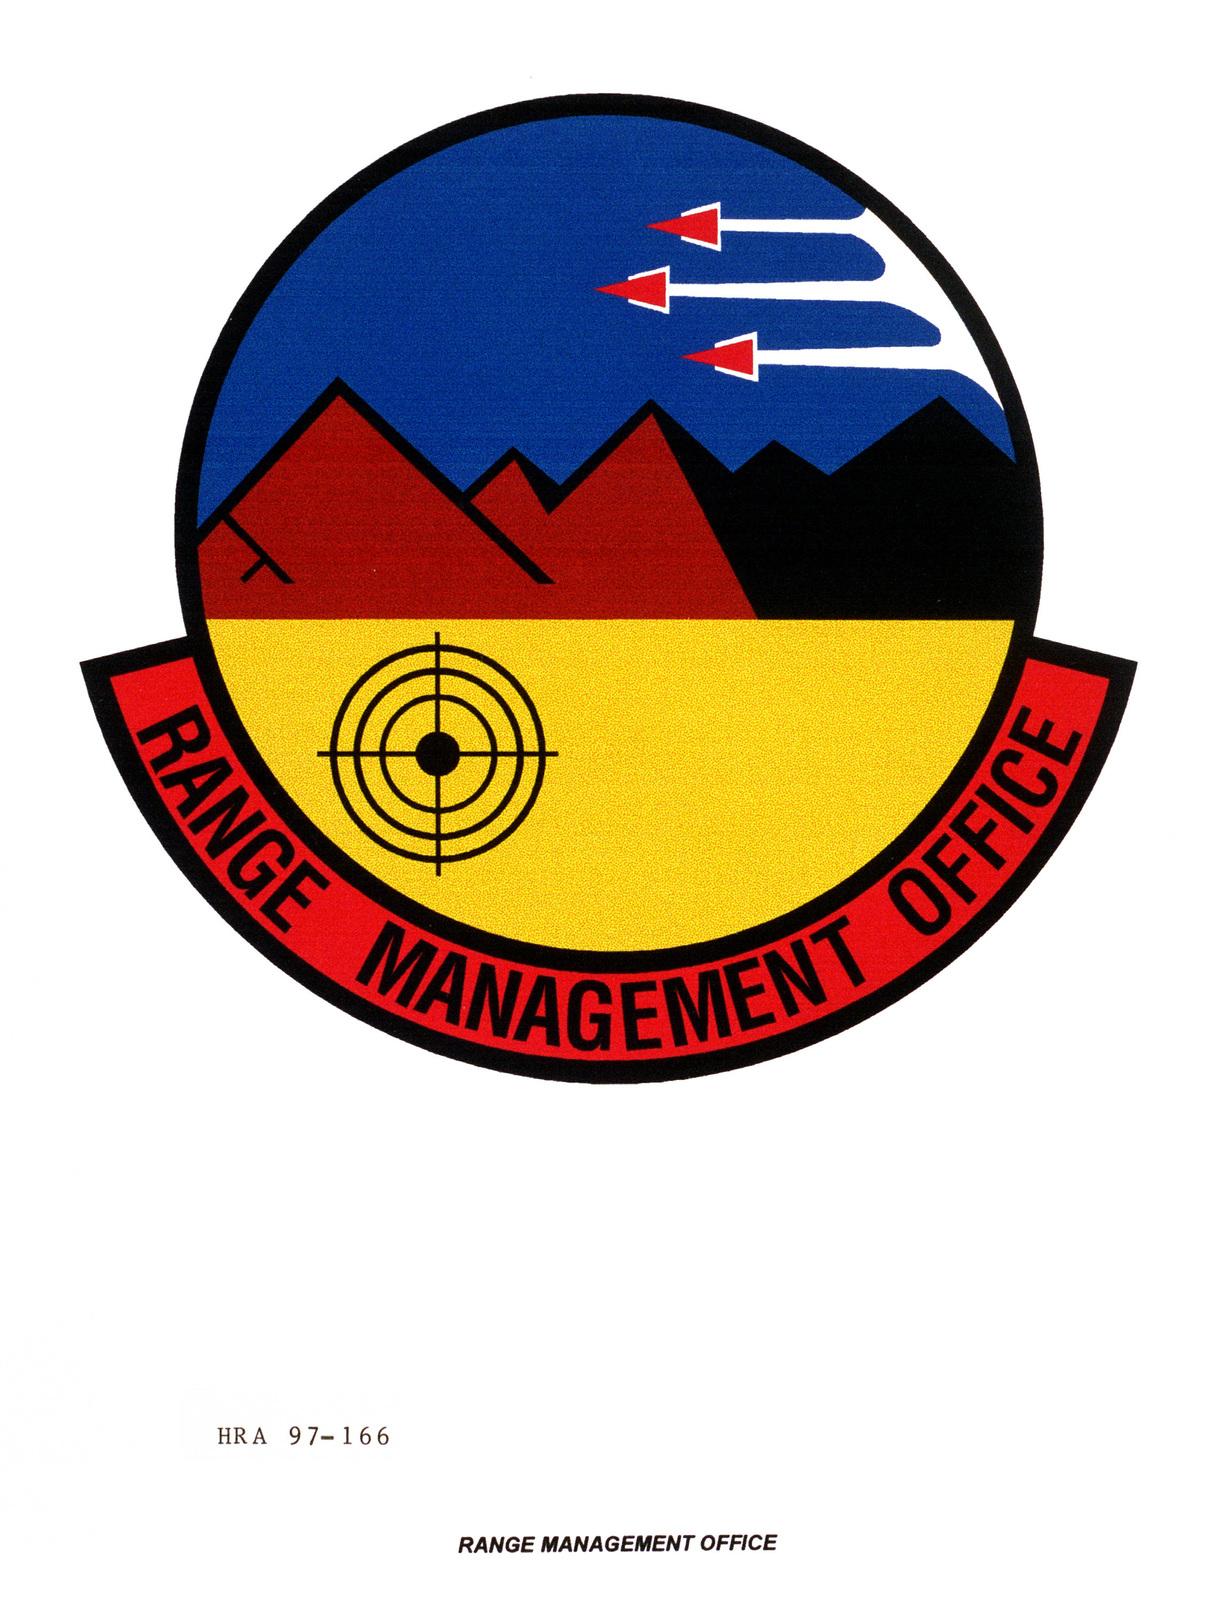 Air Force Organizational Emblem: Range Management Office, Air Combat Command